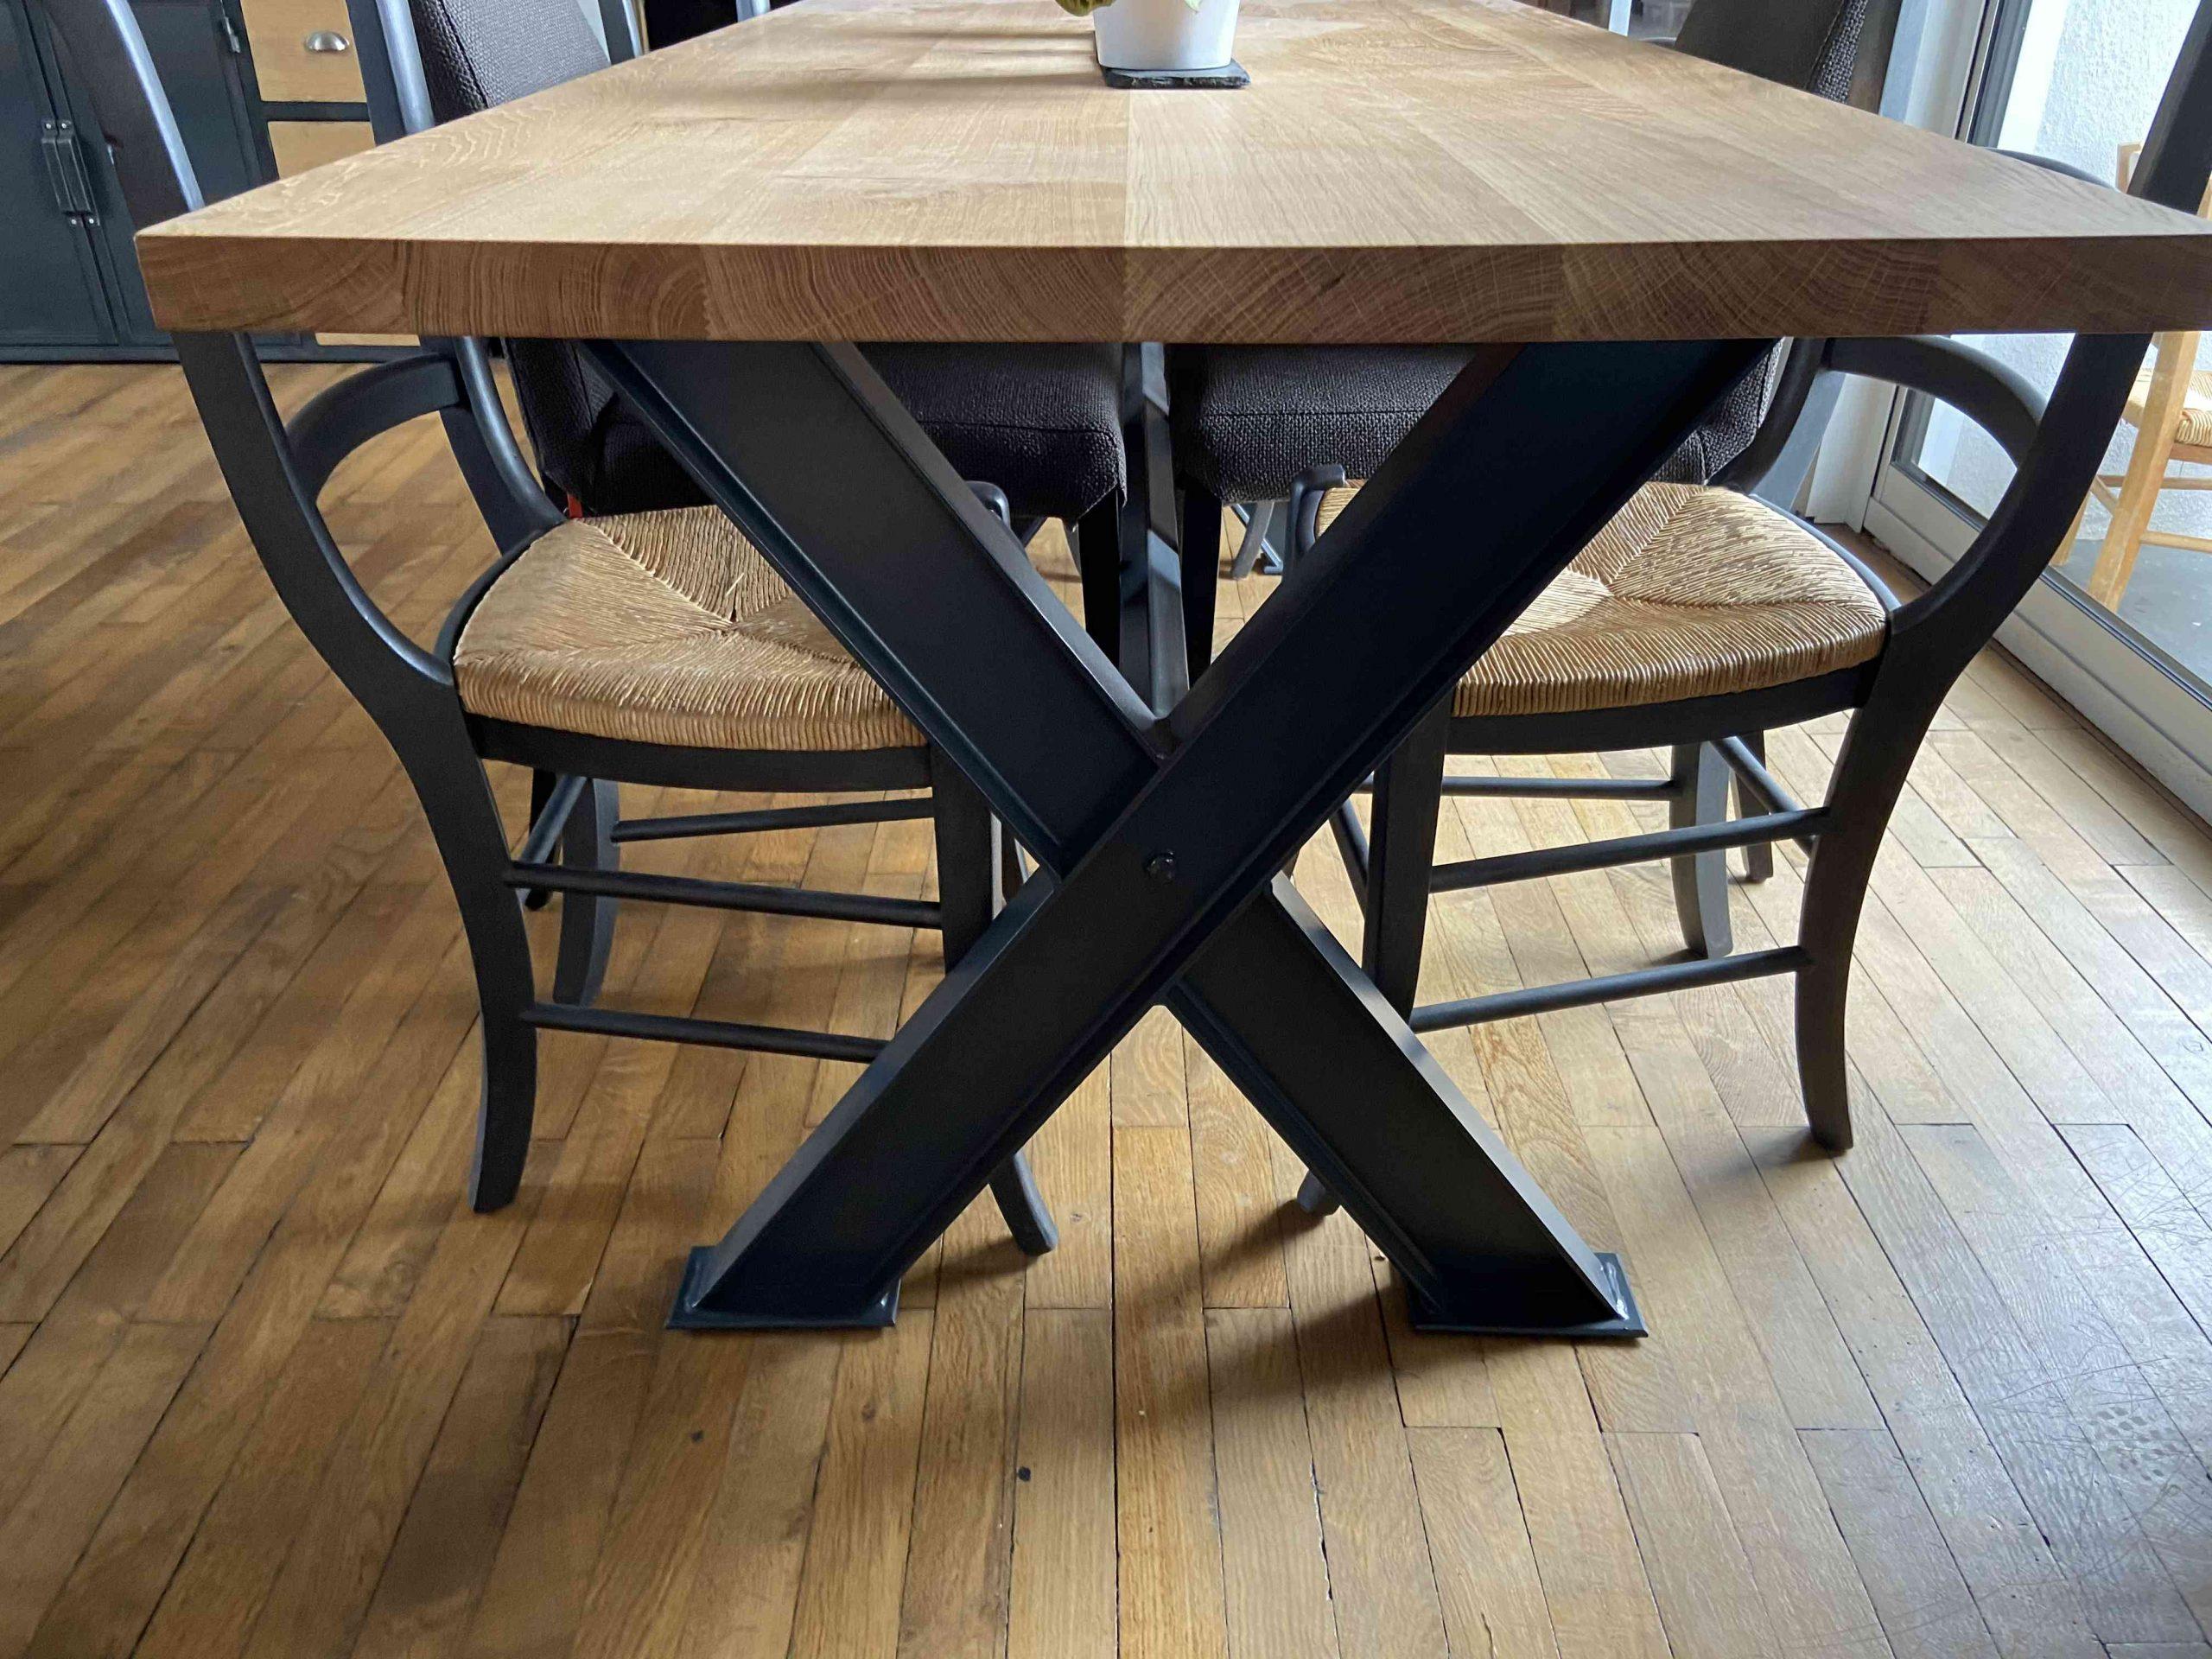 IMG 1857 1 scaled - Table de séjour chêne & métal